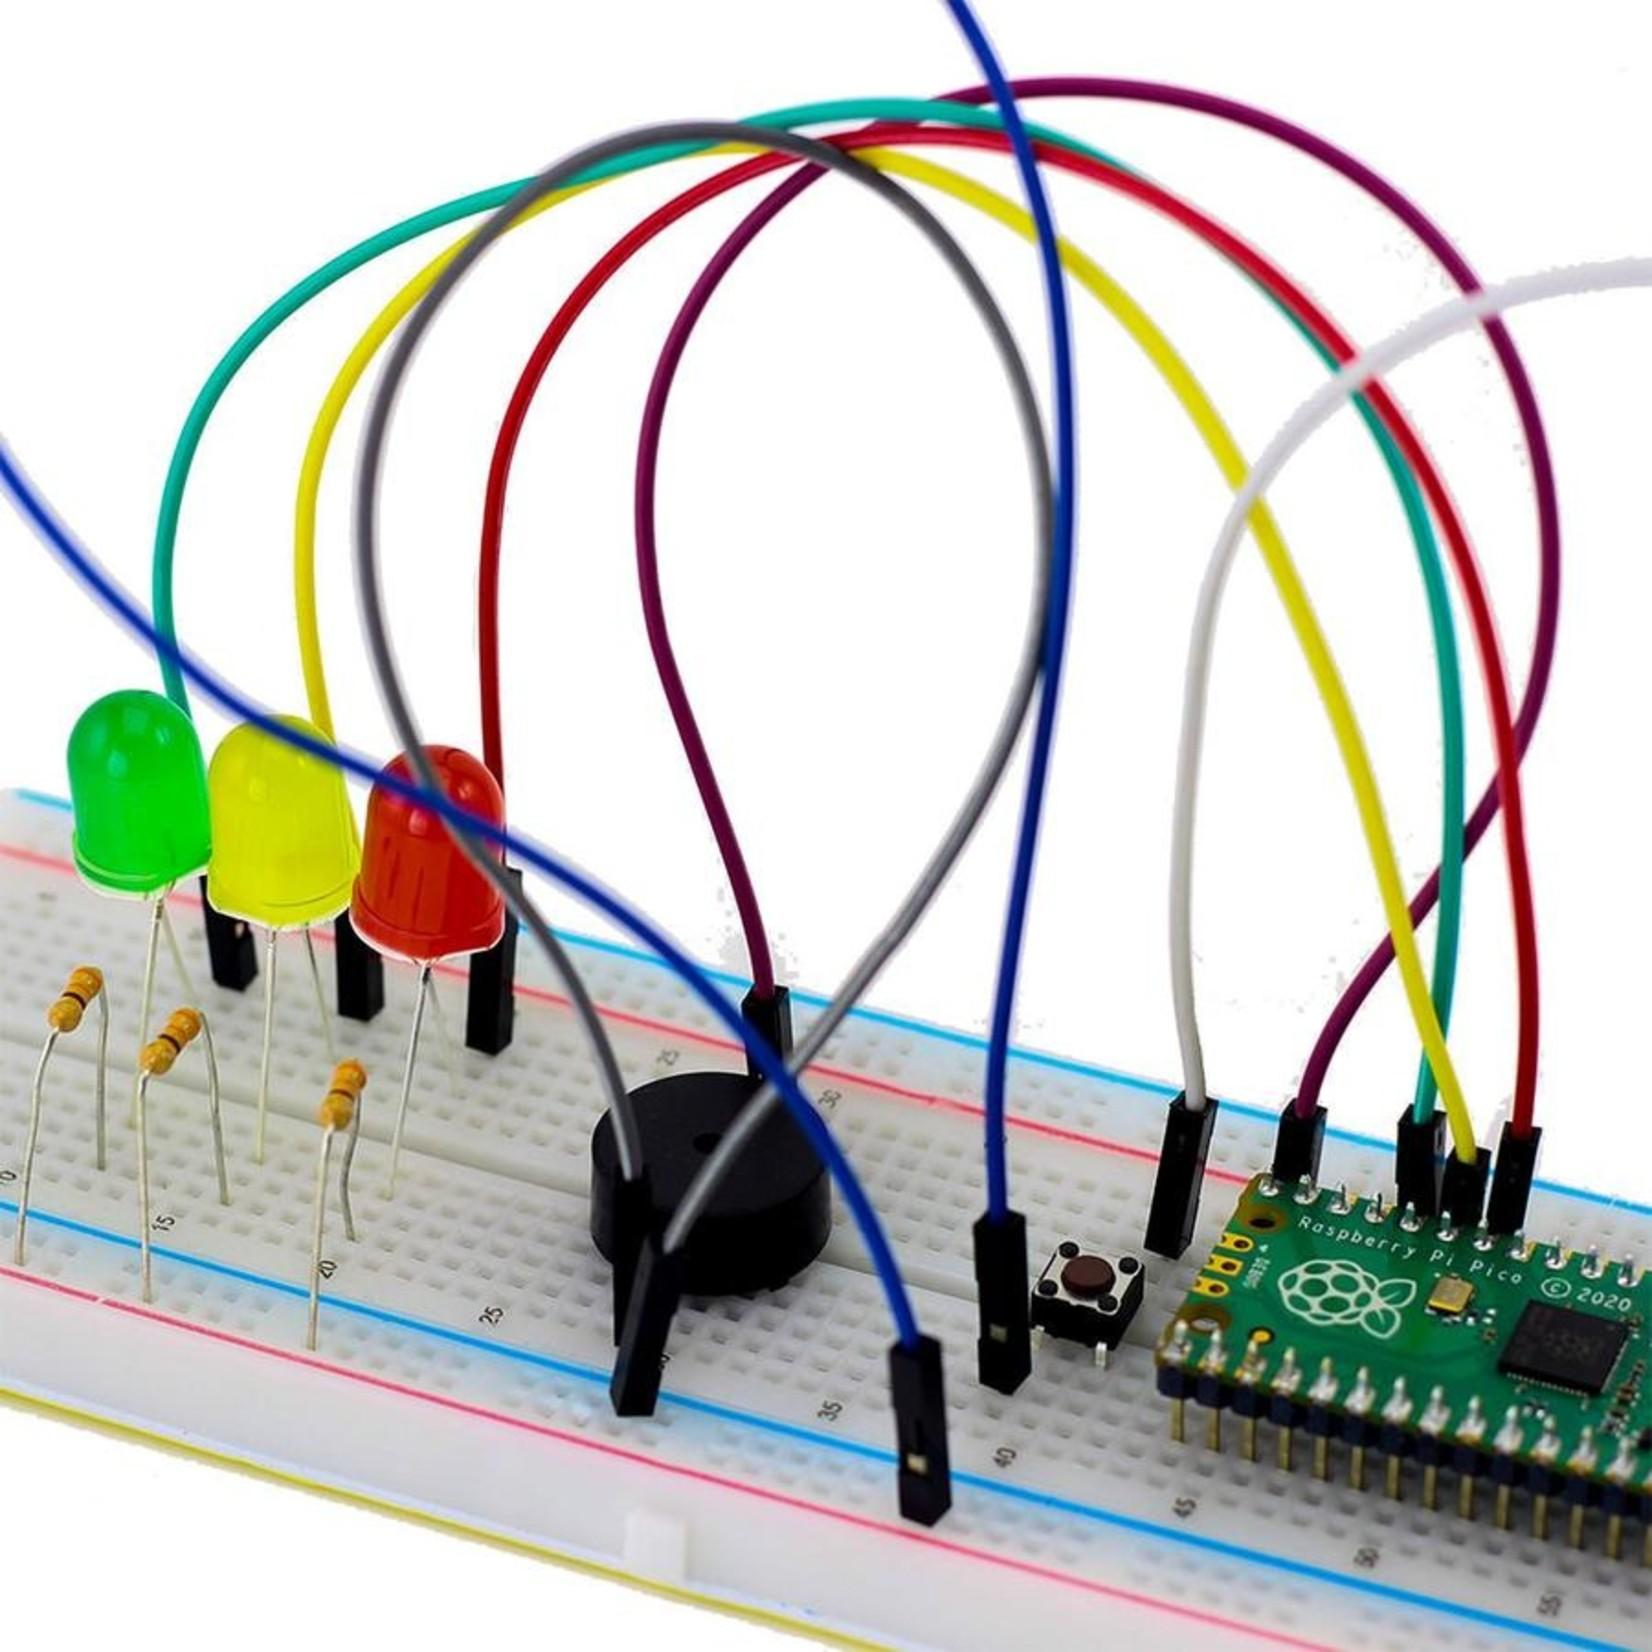 Kitronik Discovery Kit for Raspberry Pi Pico (Pico not Included)